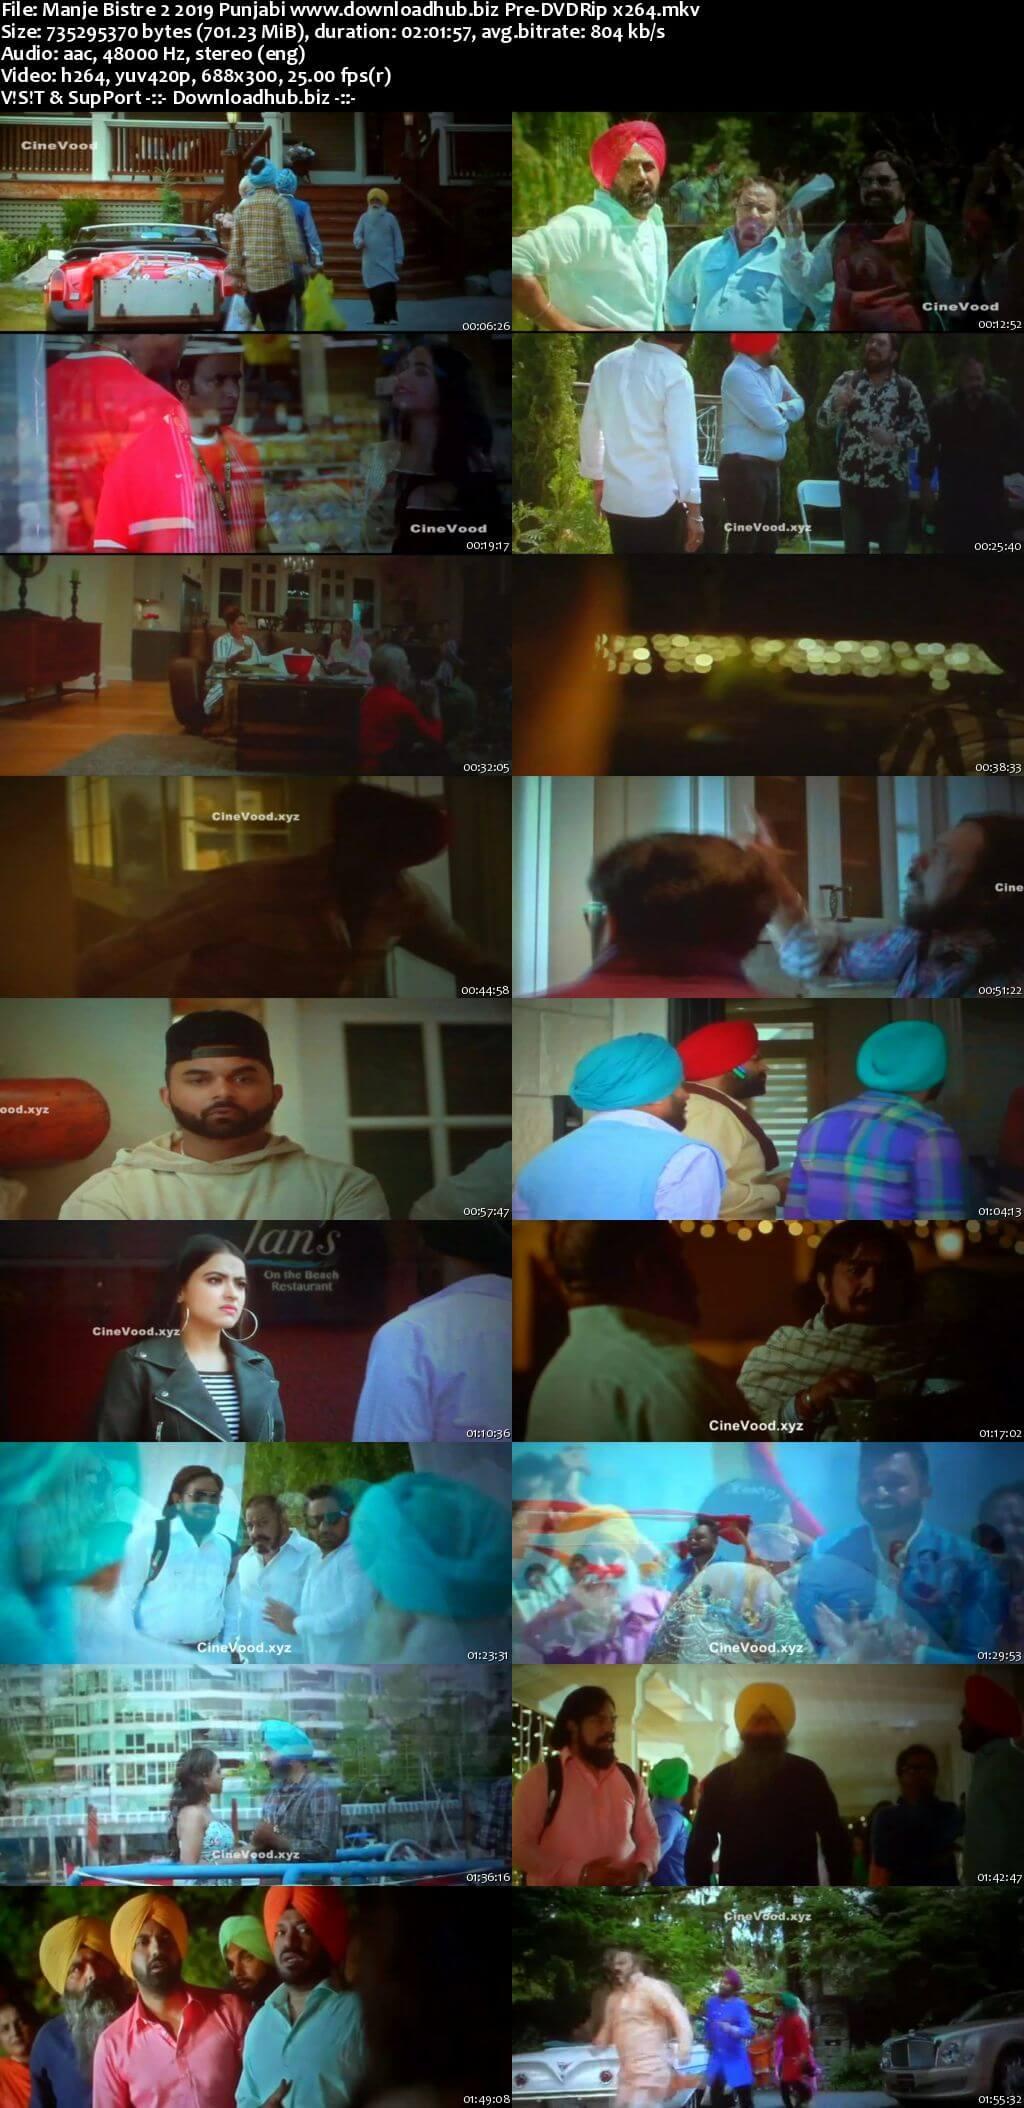 Manje Bistre 2 2019 Punjabi 700MB Pre-DVDRip x264